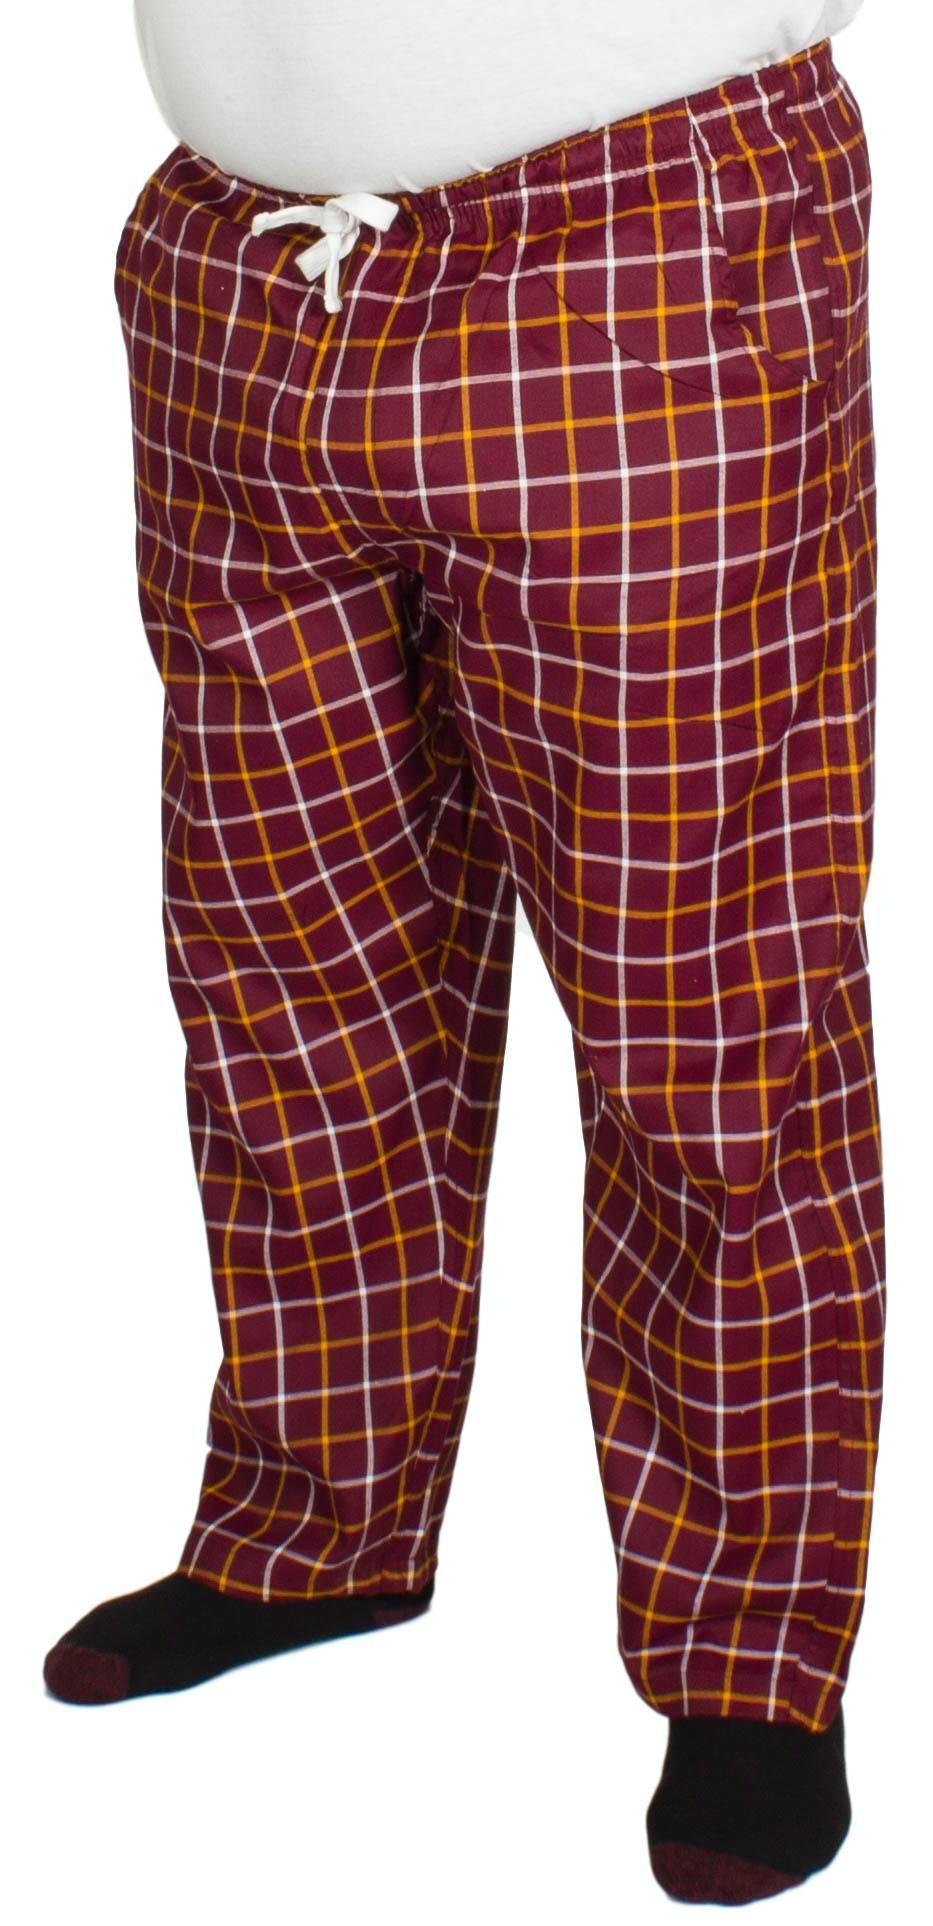 Bigdude Modern Check Lounge Pants Burgundy/Orange